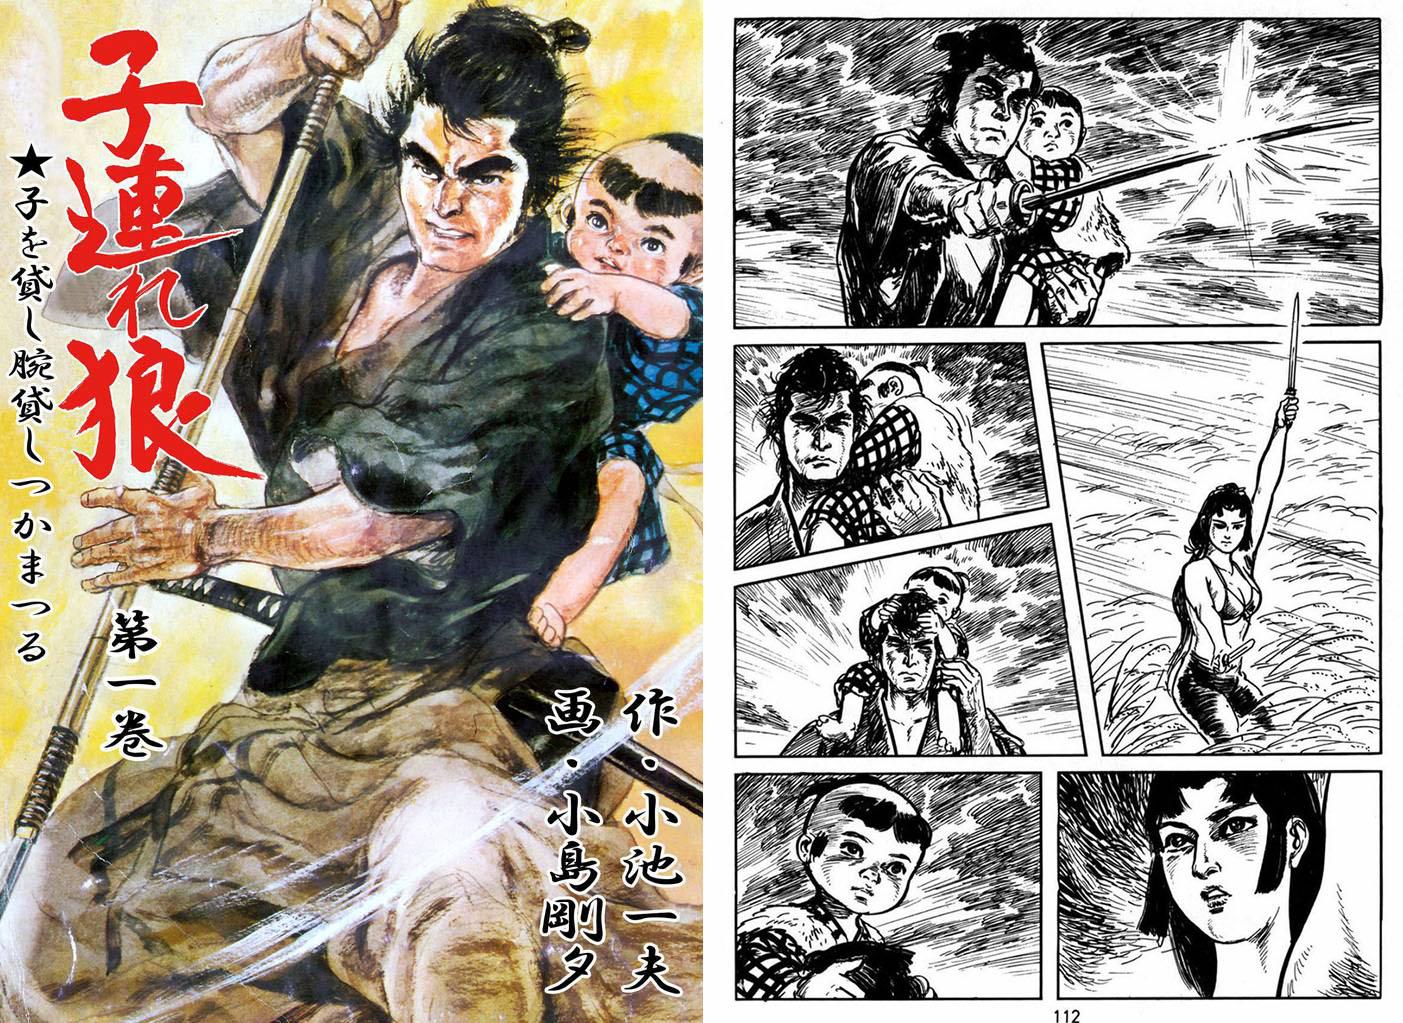 Lone Wolf and Cub manga